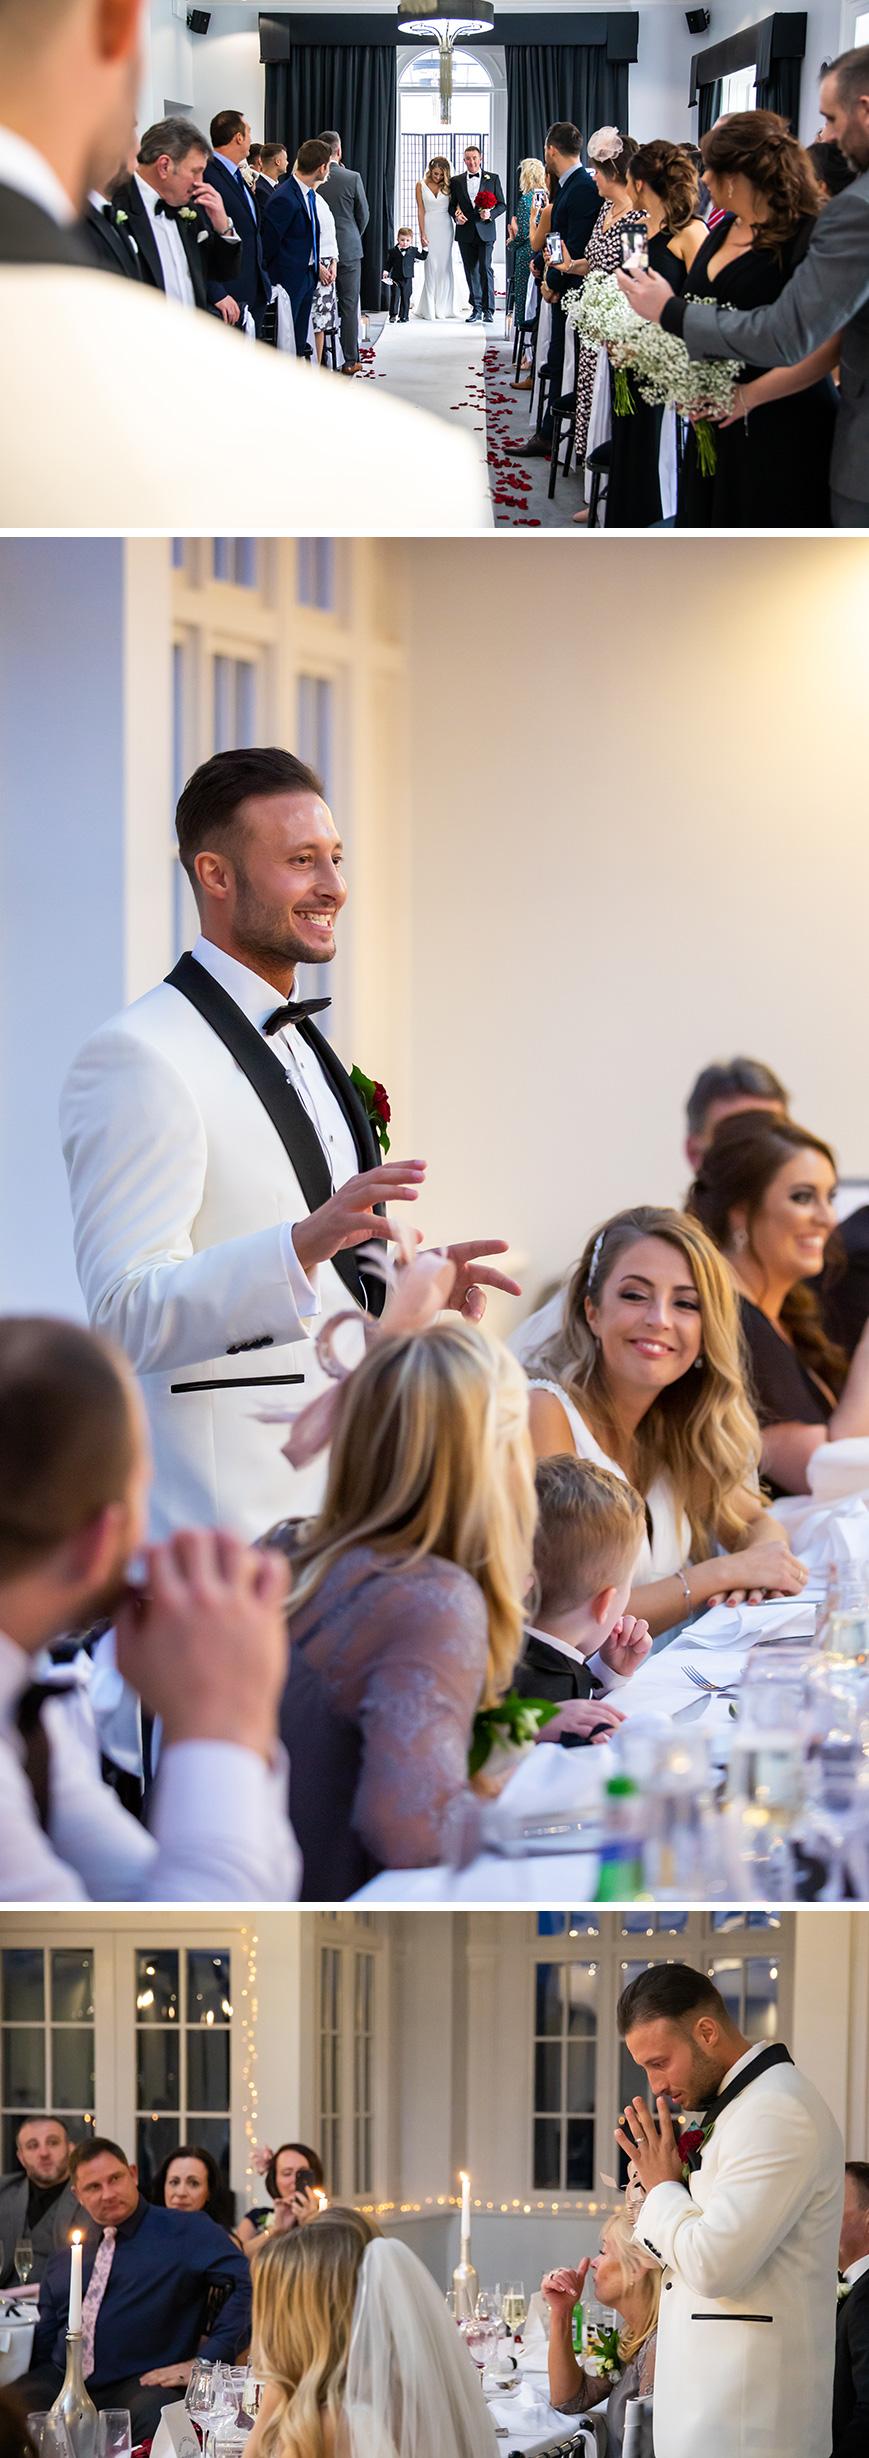 Real Wedding - Rose and David's Stylish Spring Wedding At Swynford Manor | CHWV